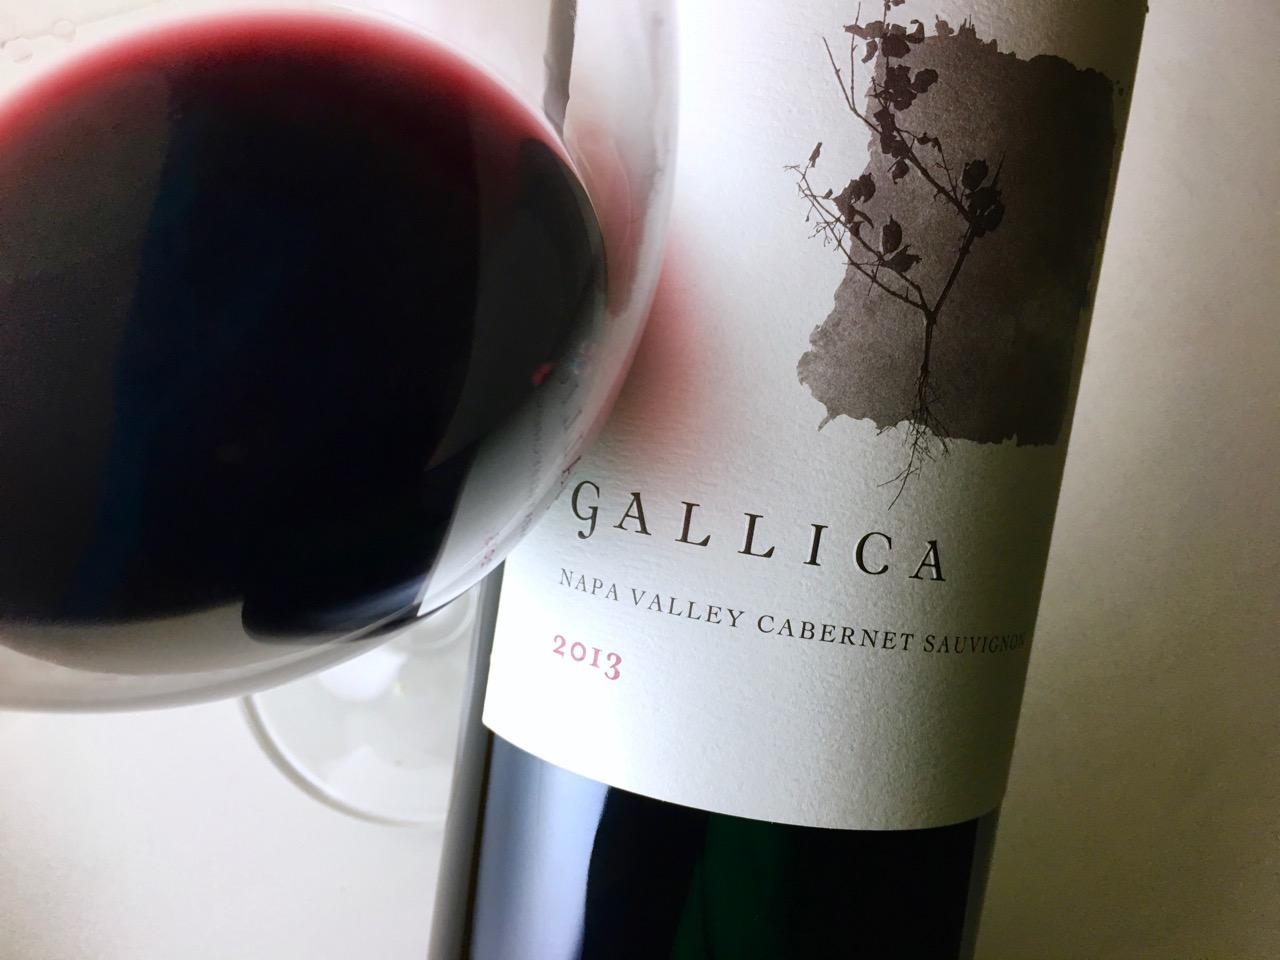 2013 Gallica Cabernet Sauvignon Napa Valley